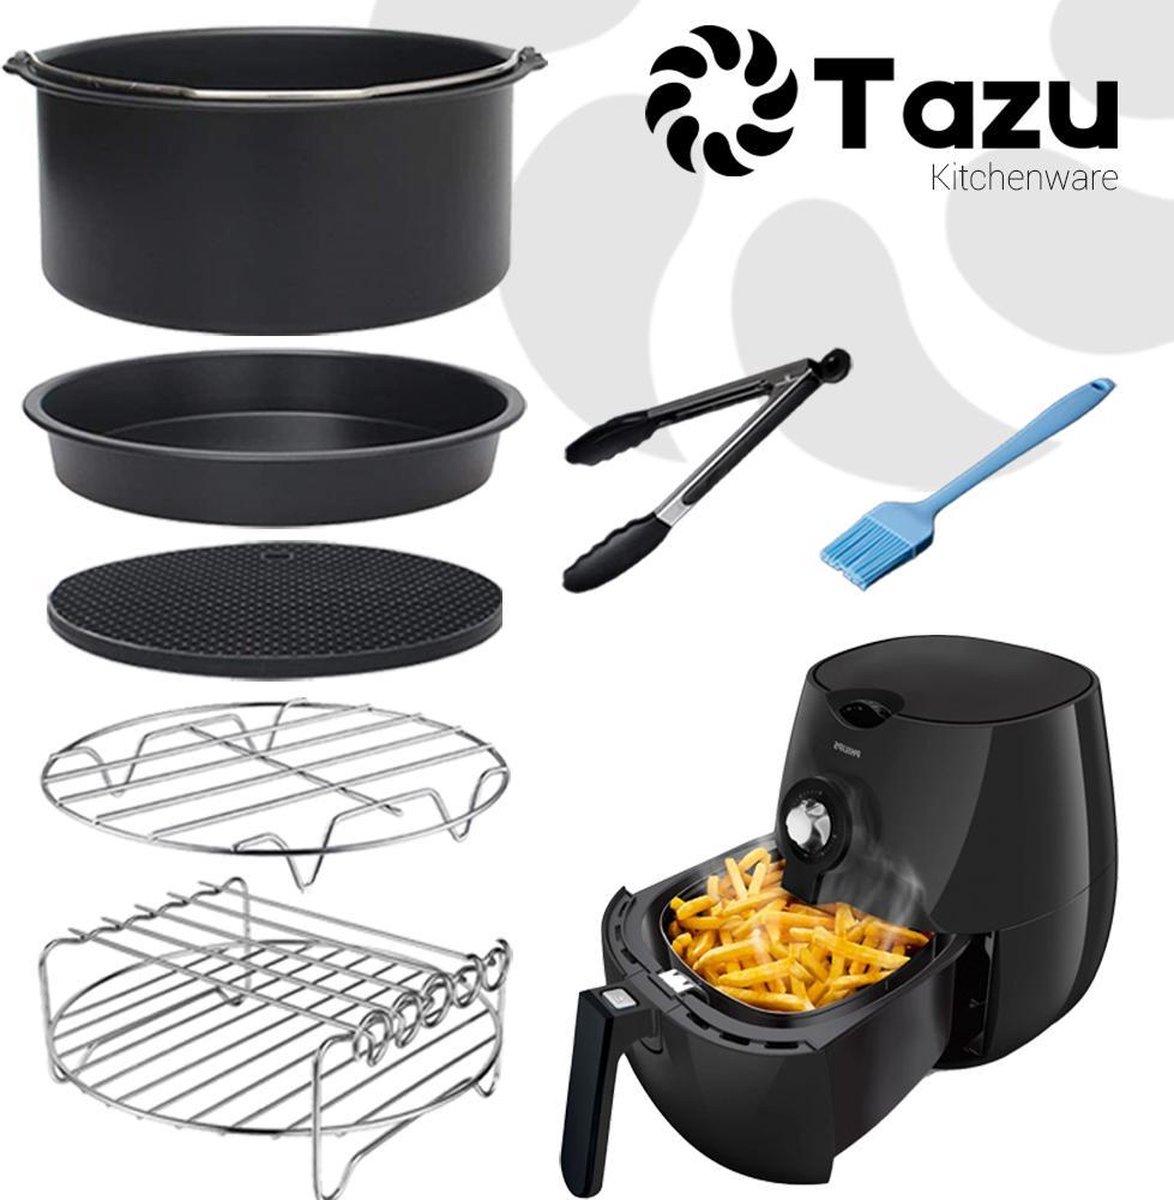 Tazu Heteluchtfriteuse Accessoireset XL - ⌀ 20cm